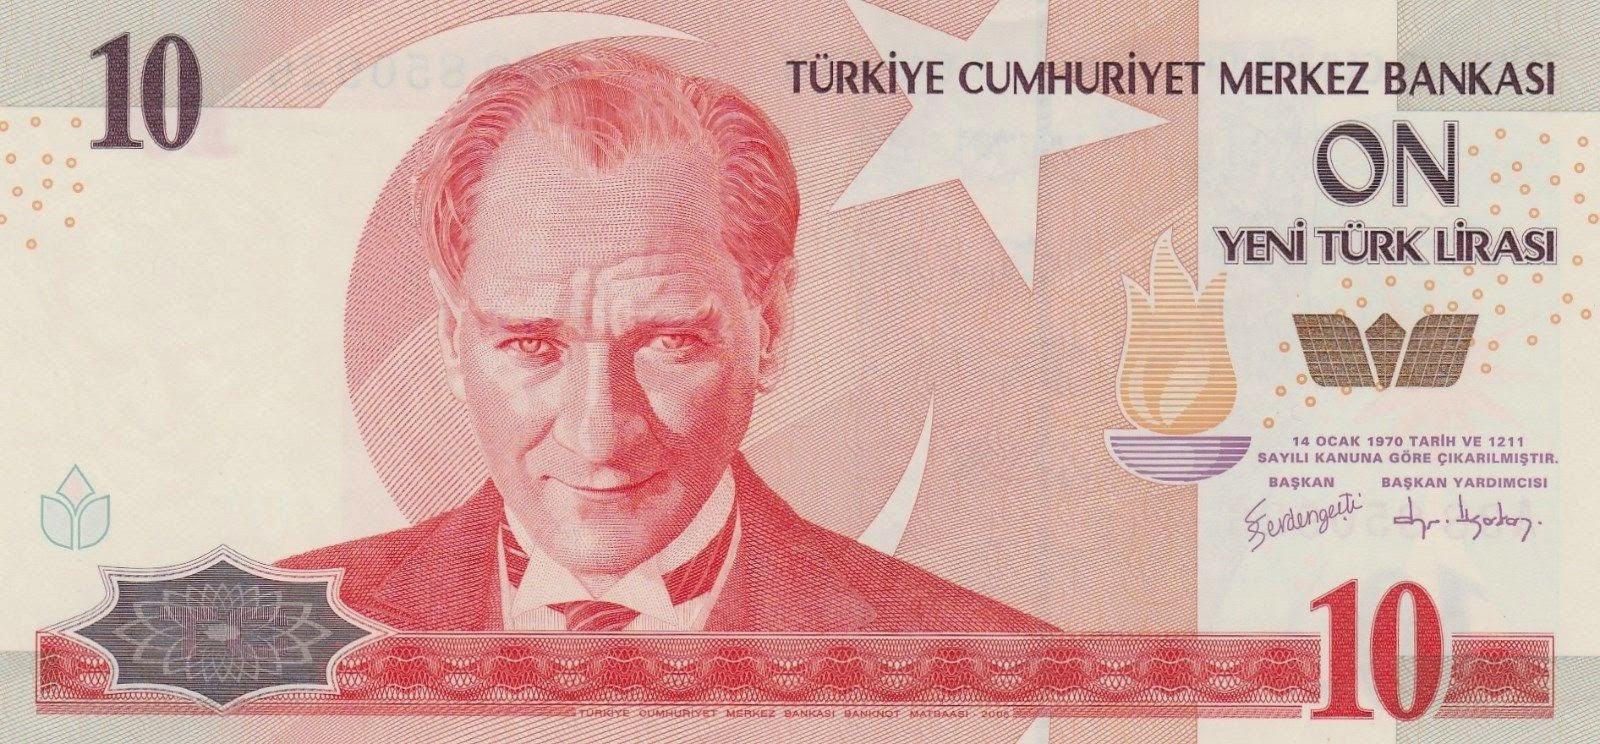 "Turkey Currency 10 New Turkish Lira ""Yeni Türk Lirasi"" banknote 2005 Mustafa Kemal Atatürk"